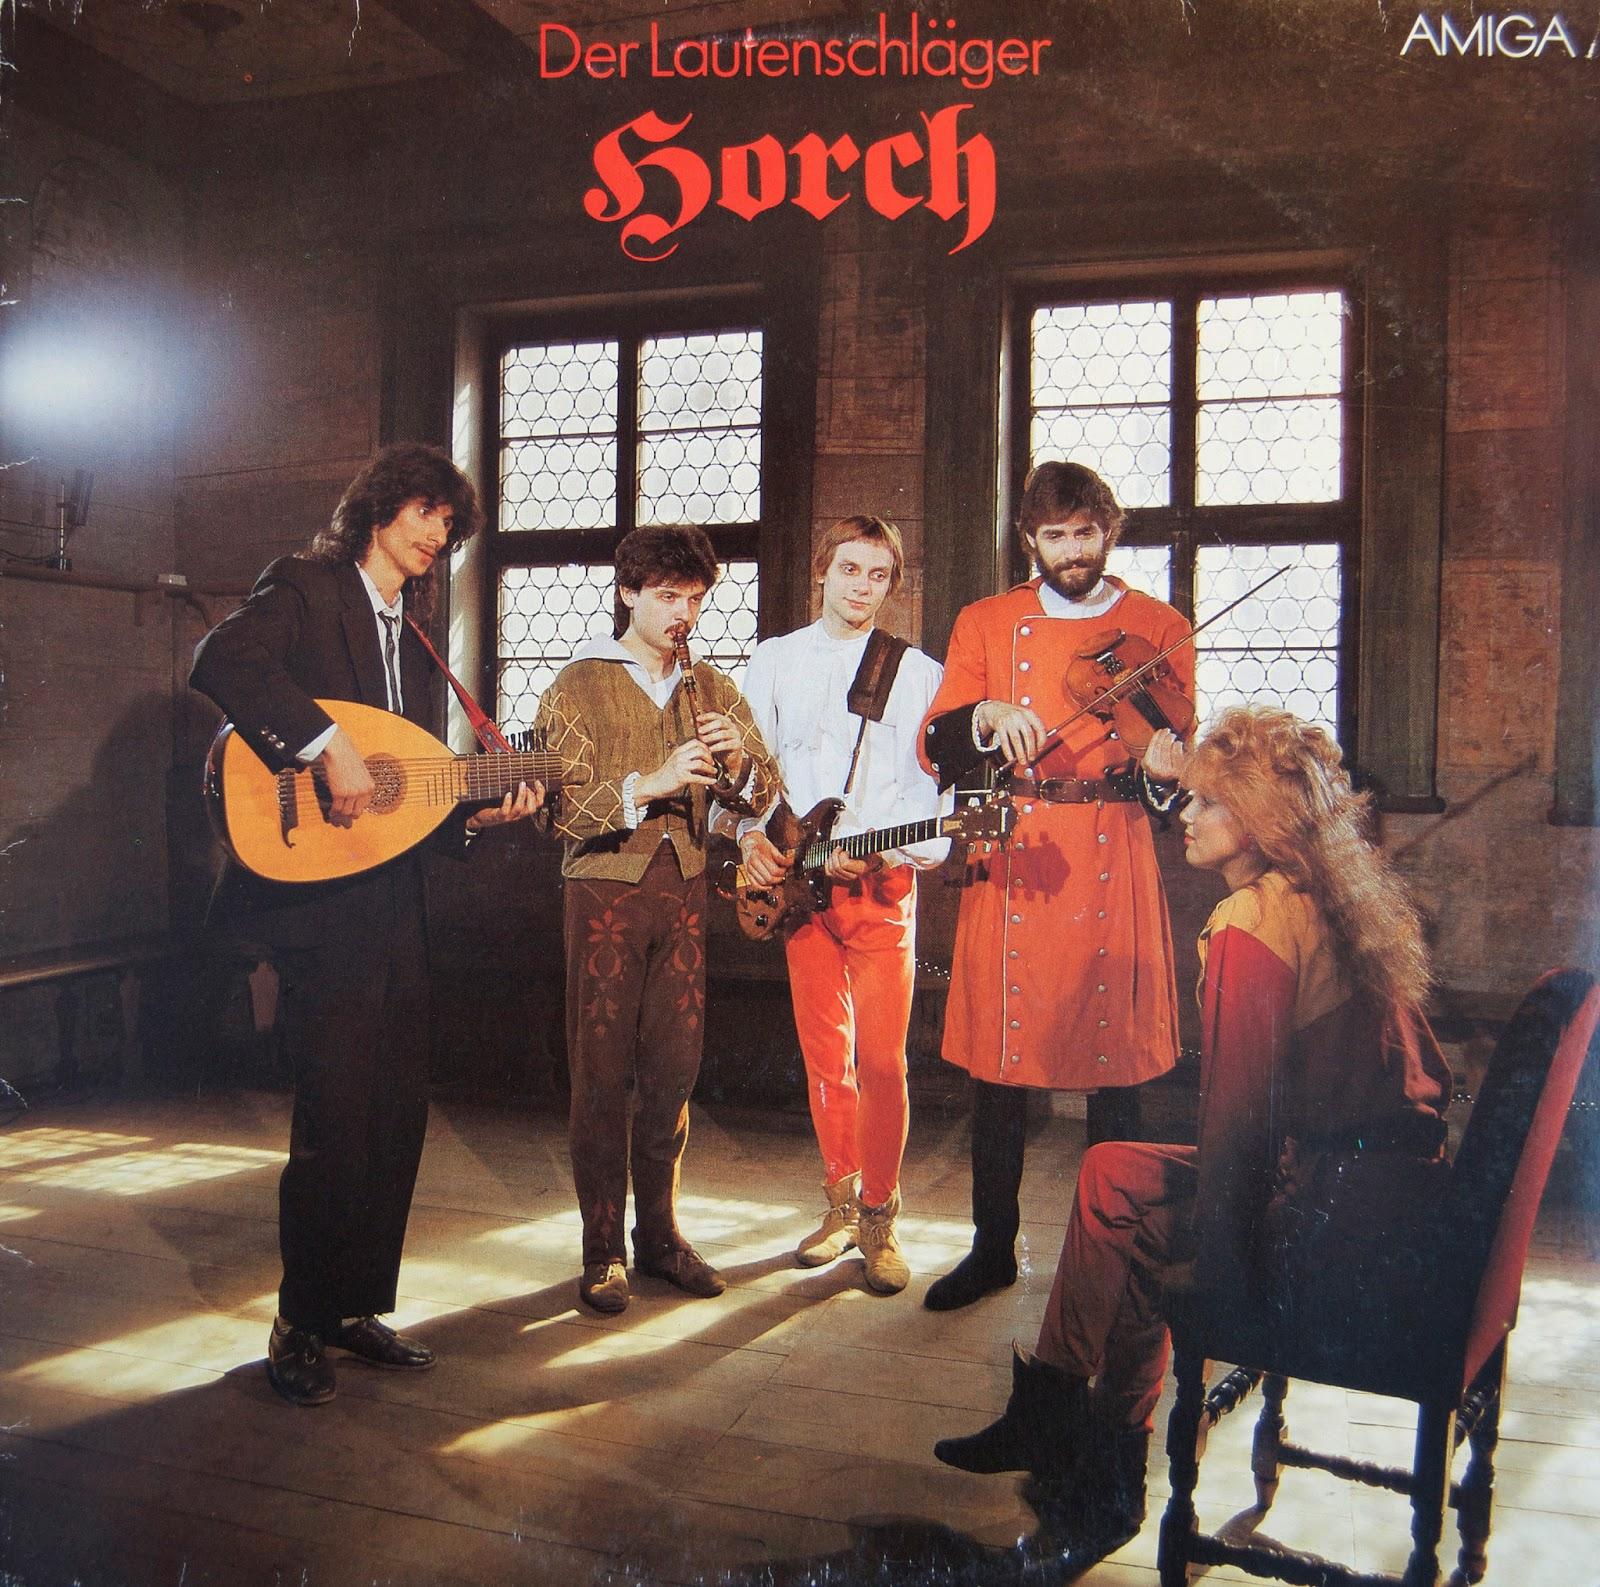 Horch+-+Der+Lautenschl%C3%A4ger.jpg